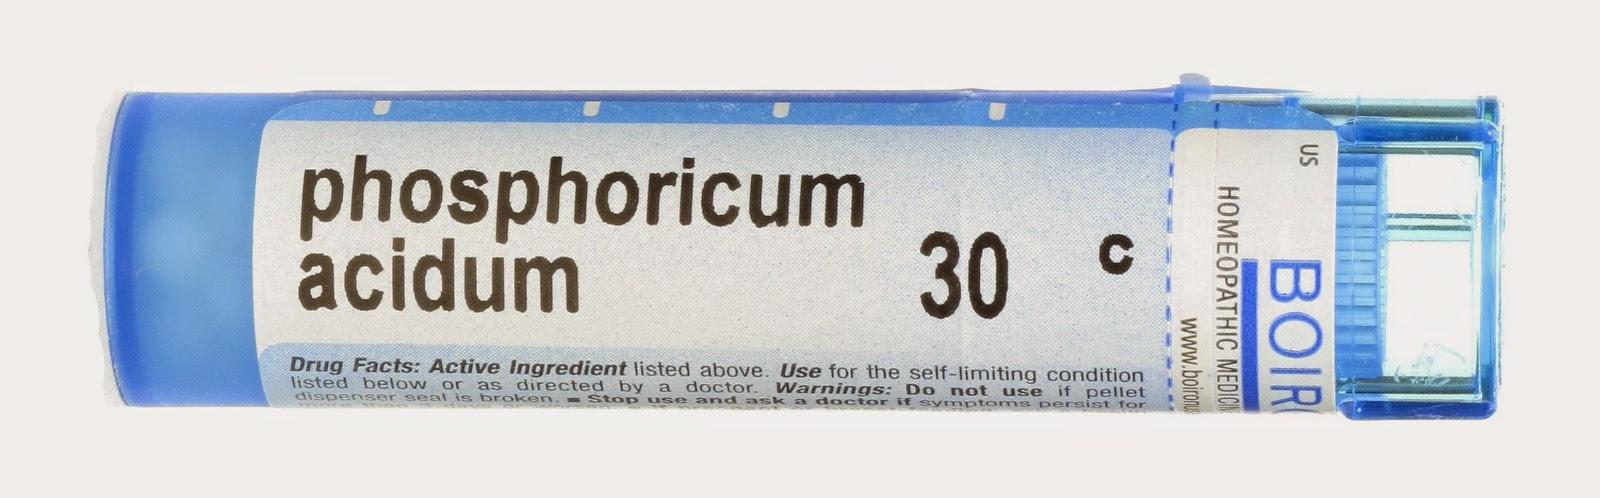 Homeopatia phosphoricum acidum $15 christmas gift ideas